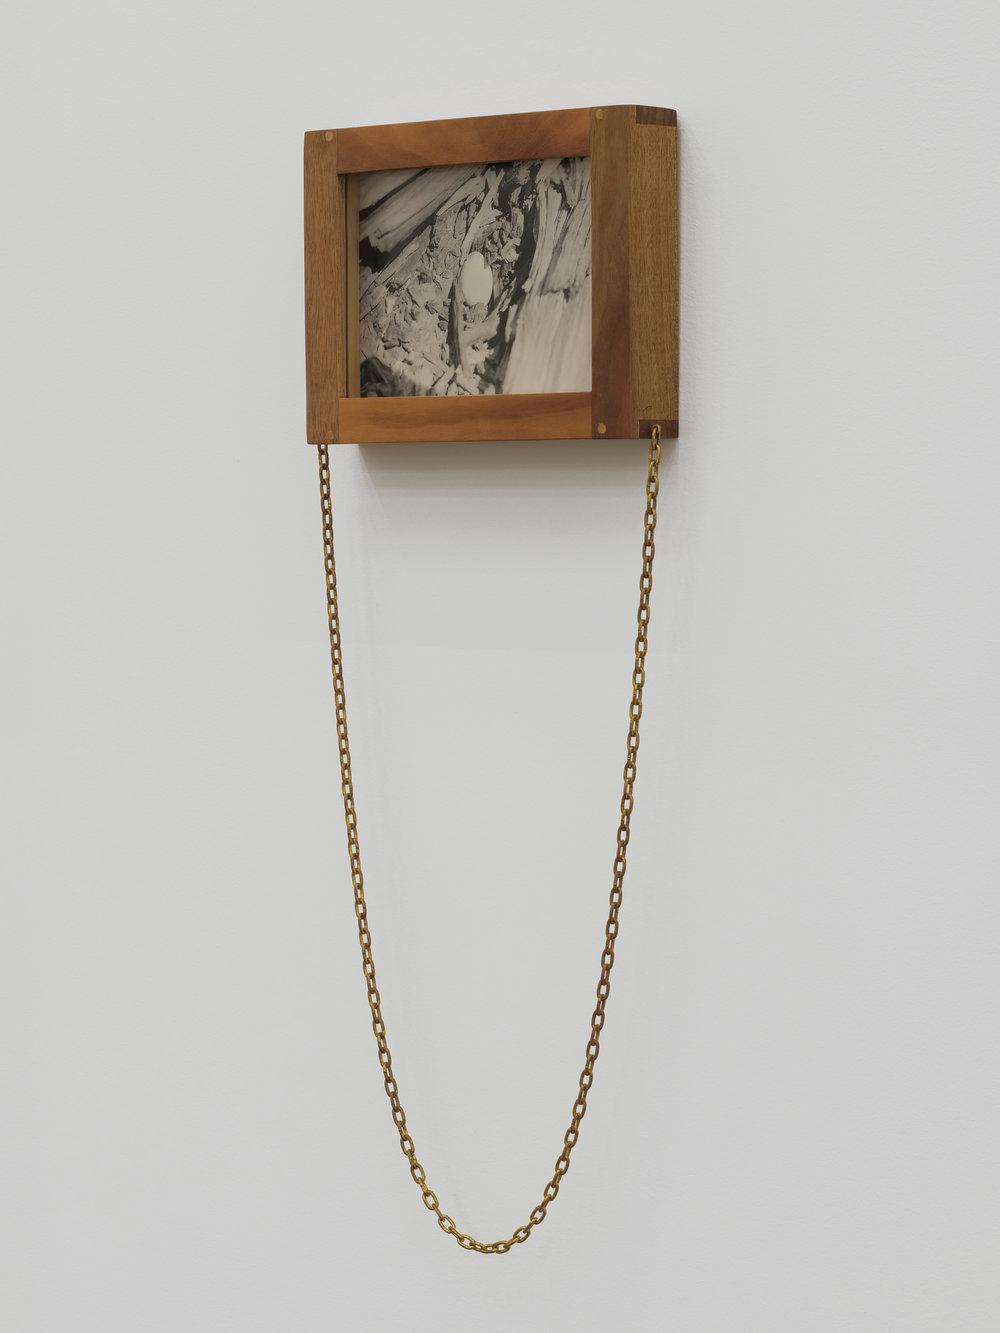 Will Rogan,  Eclipse Egg , 2018, Silver gelatin print, wood, clock chain, 22 x 8 1/2 x 1 1/2 in